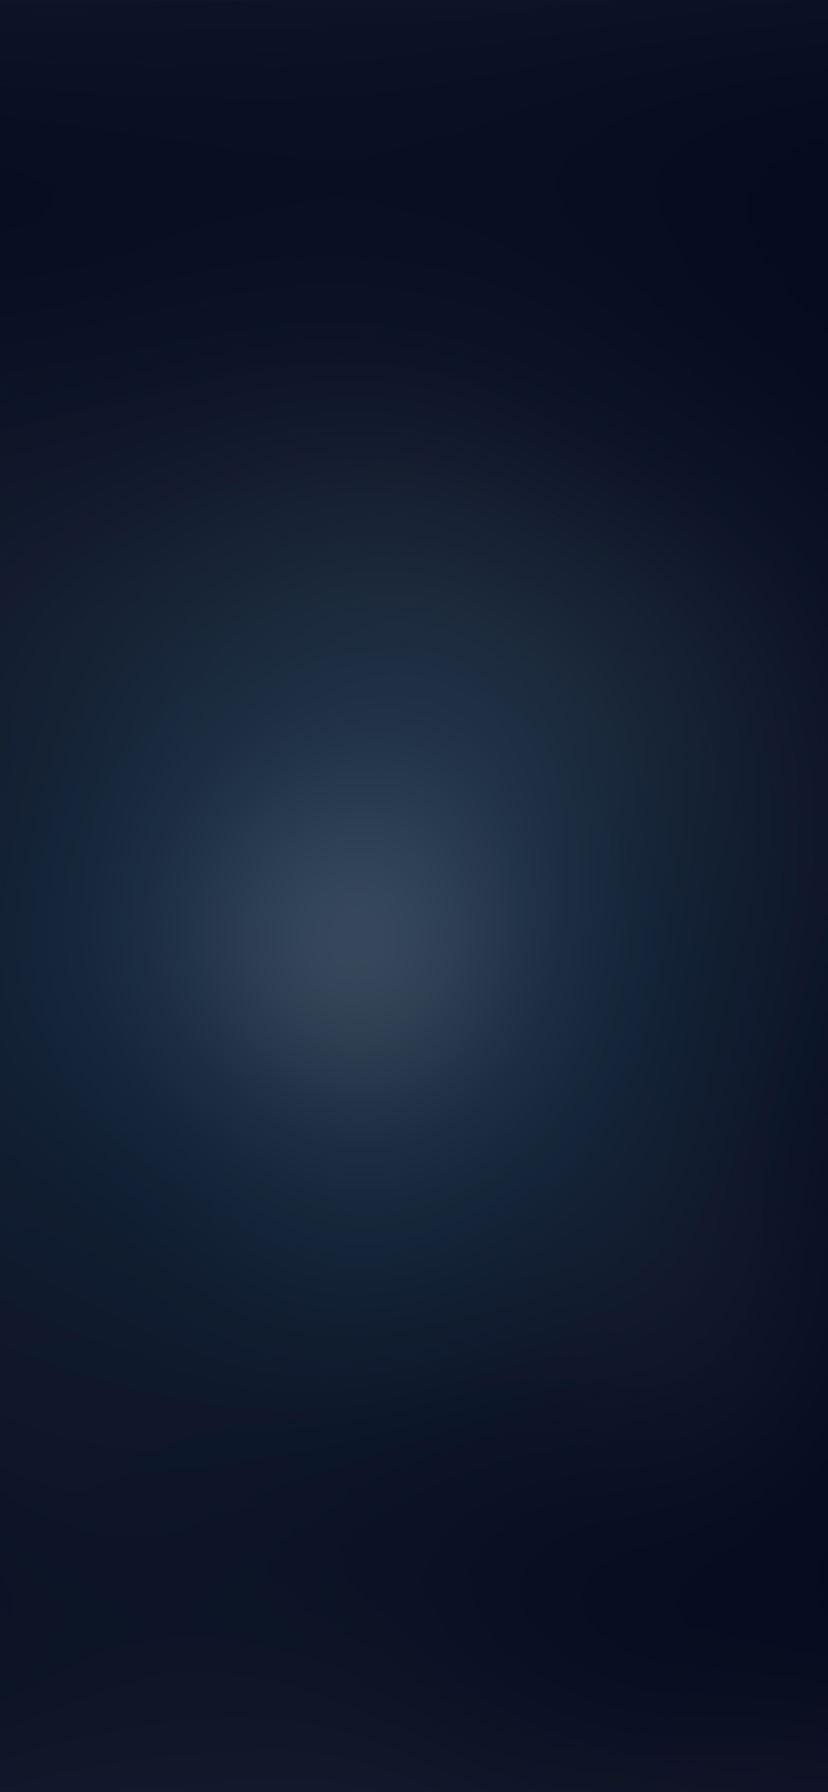 Dark Blue Night Gradation Blur Iphone 11 Wallpapers Free Download